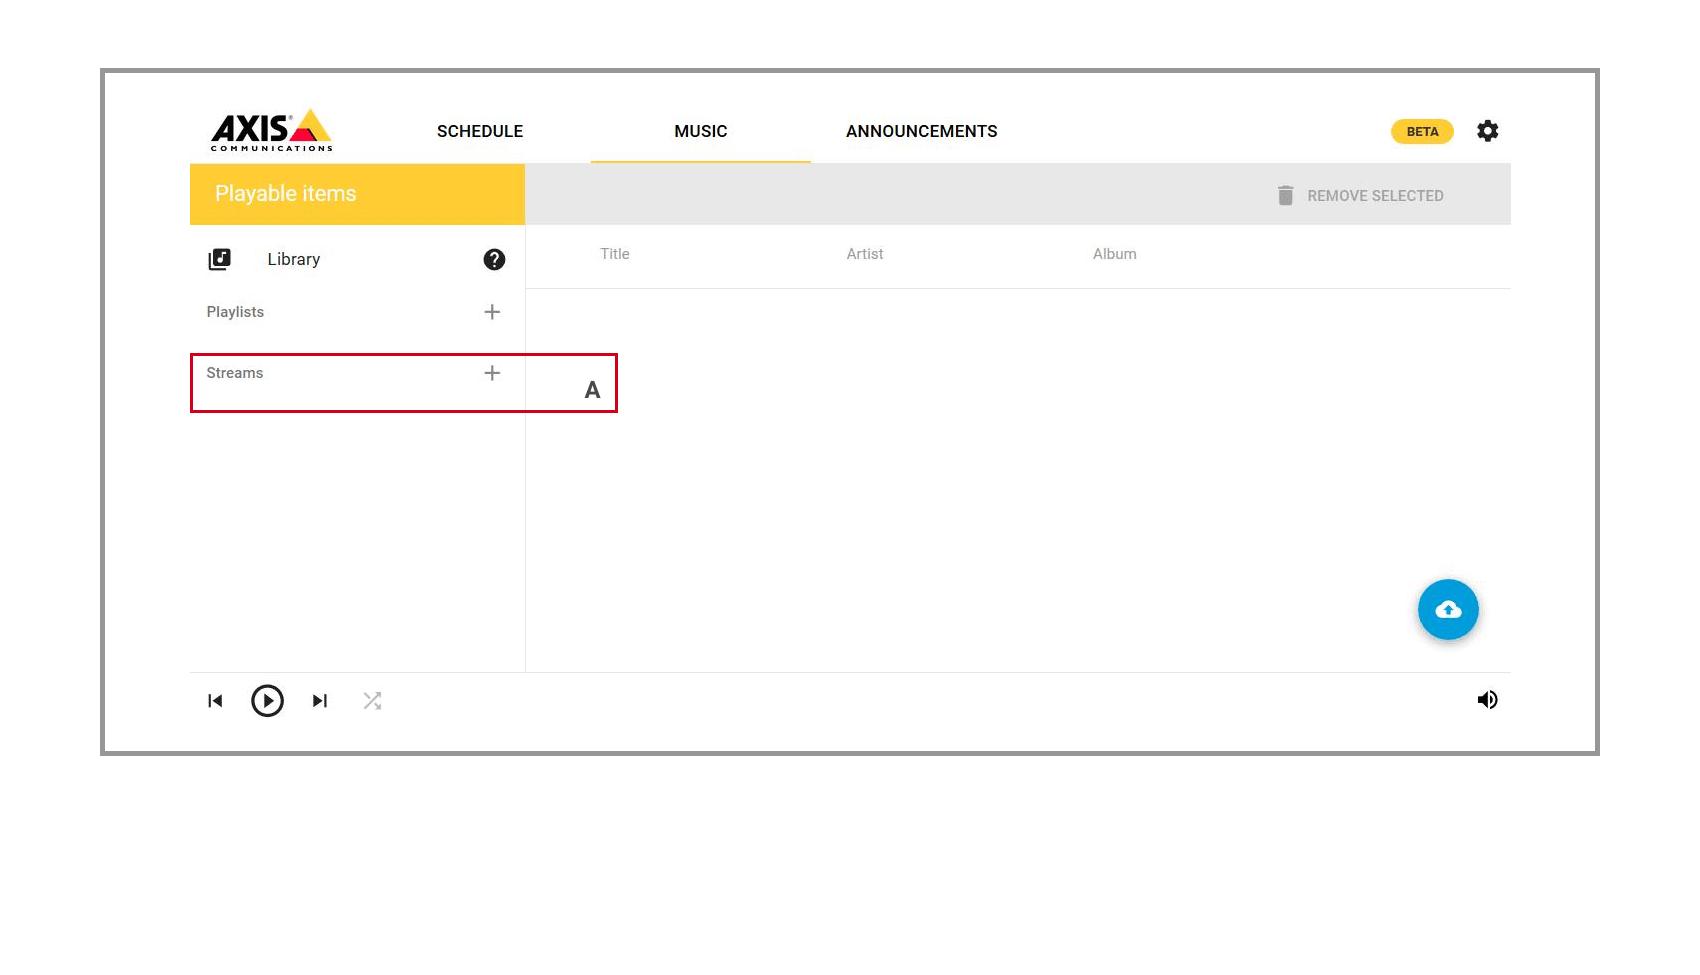 17 Axis Musik Verwaltung Detailscreen